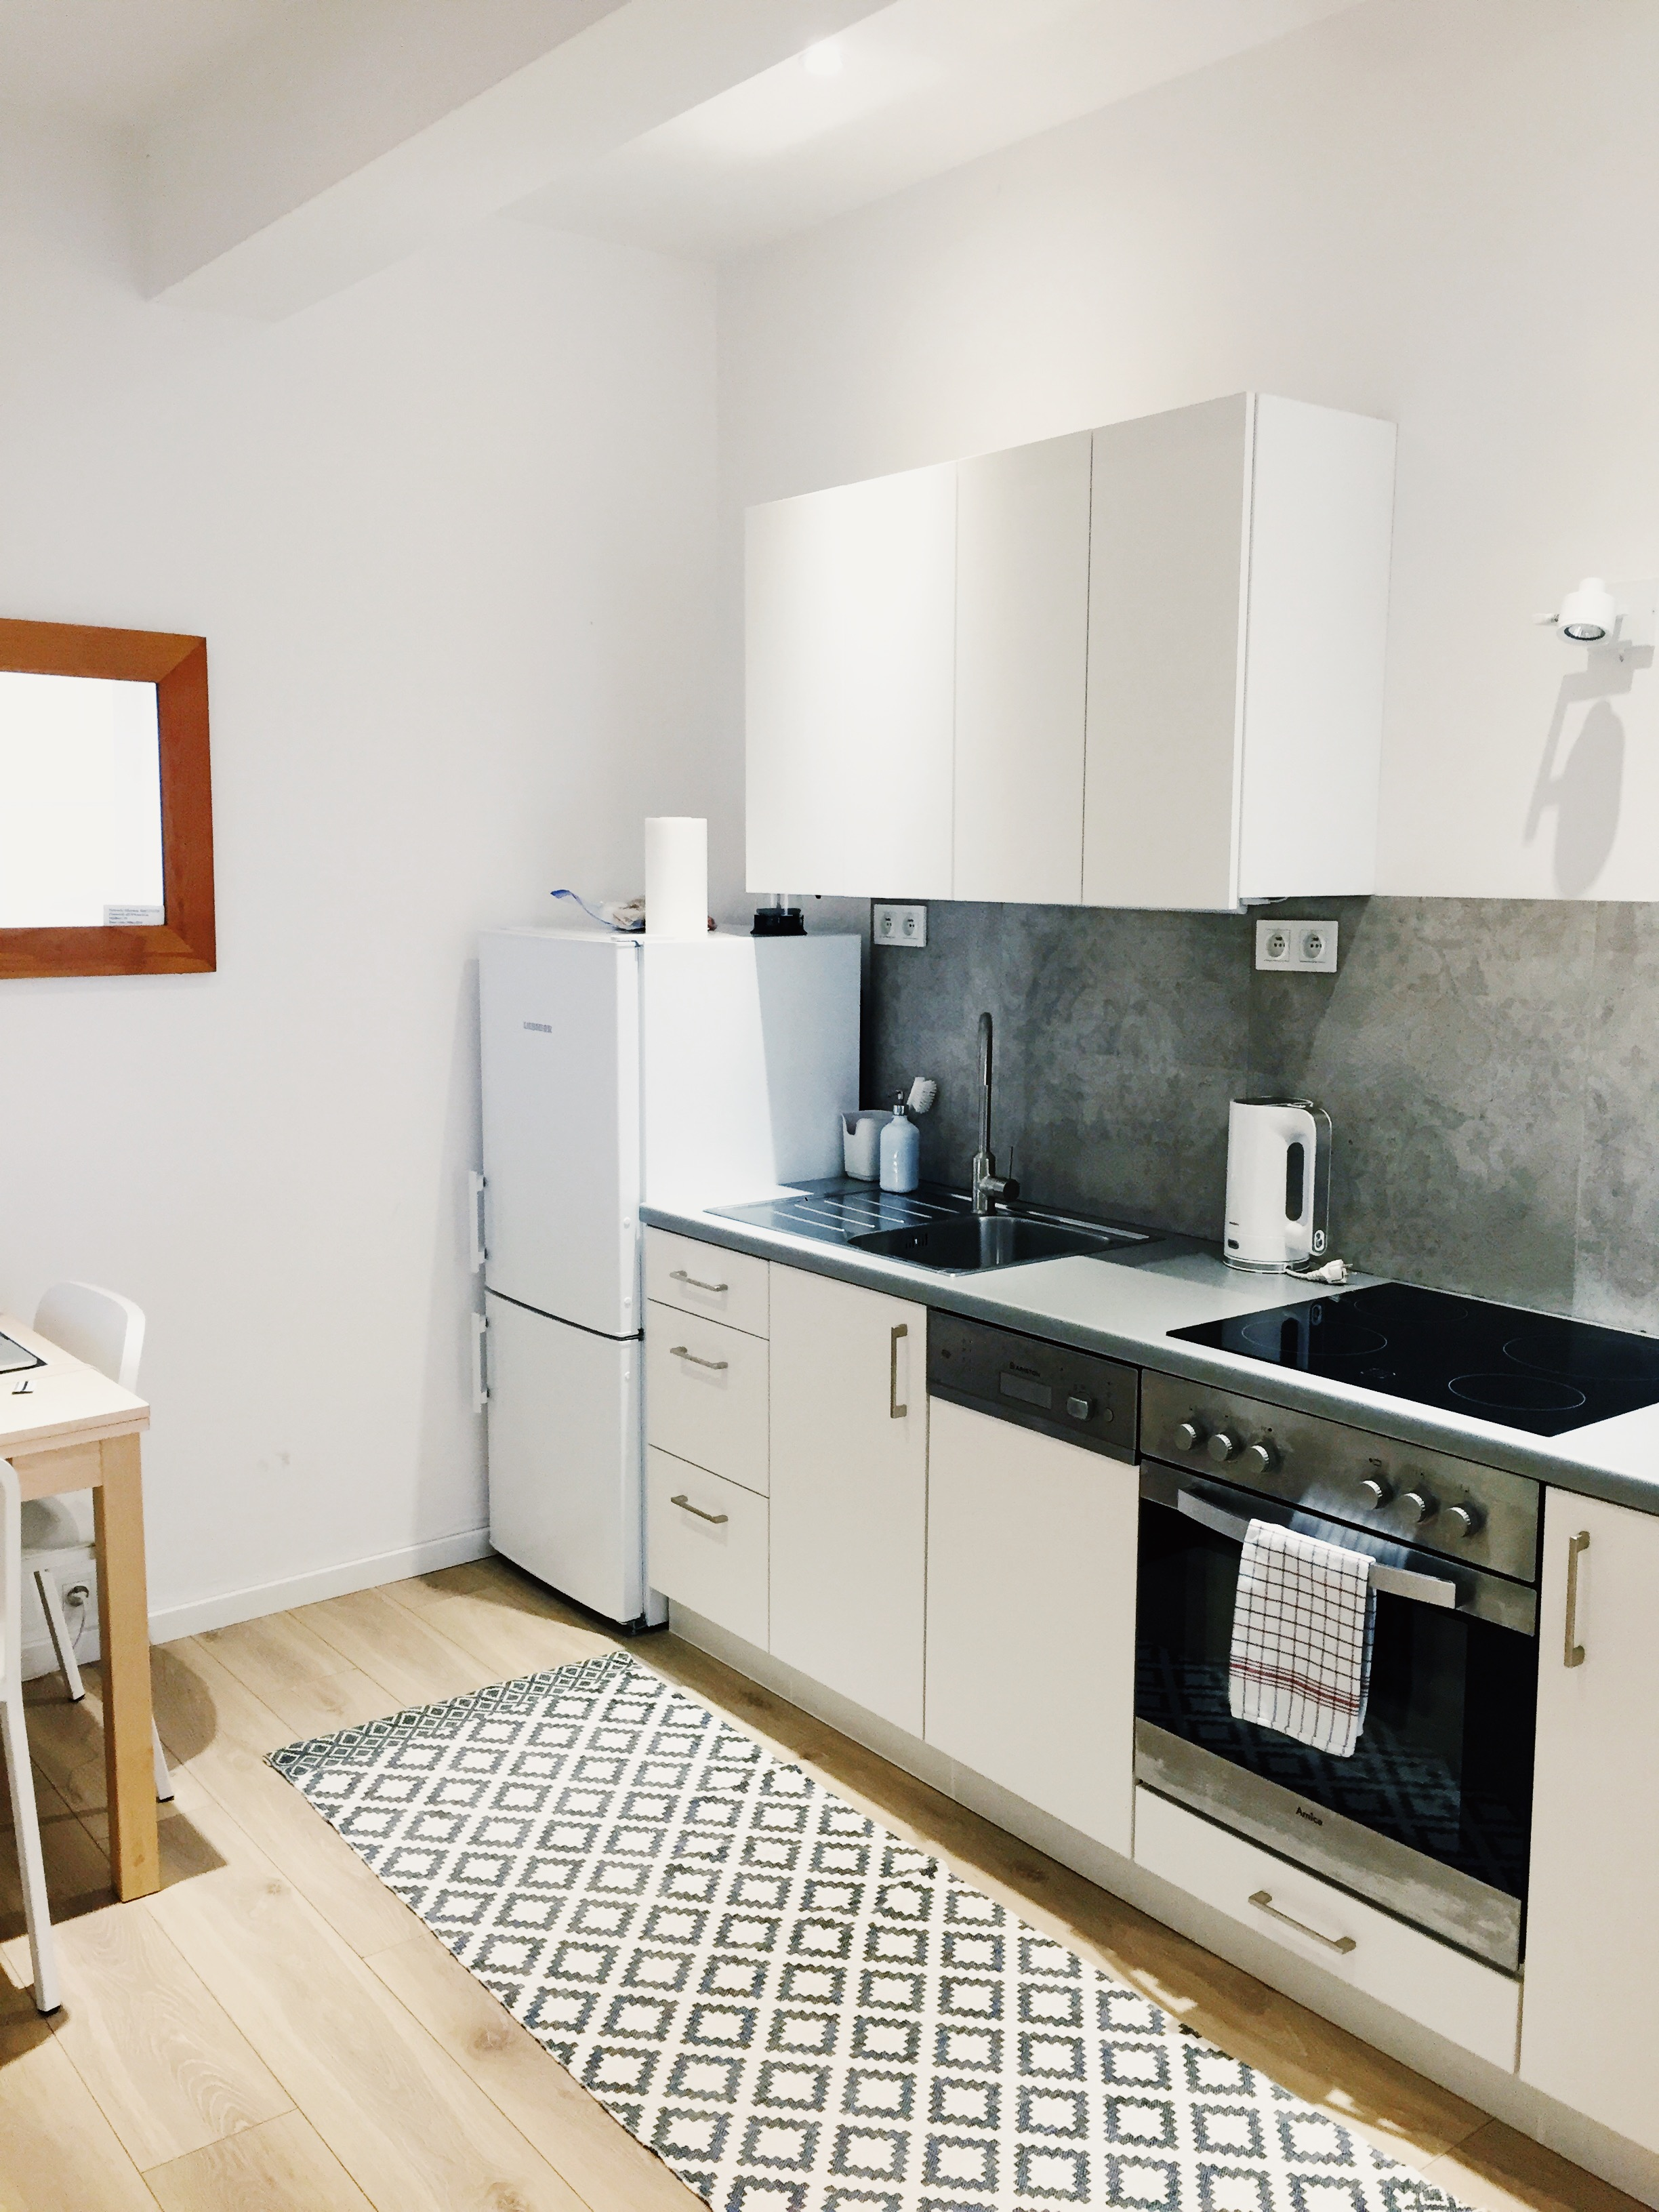 Our minimalistic abode in Kraków.